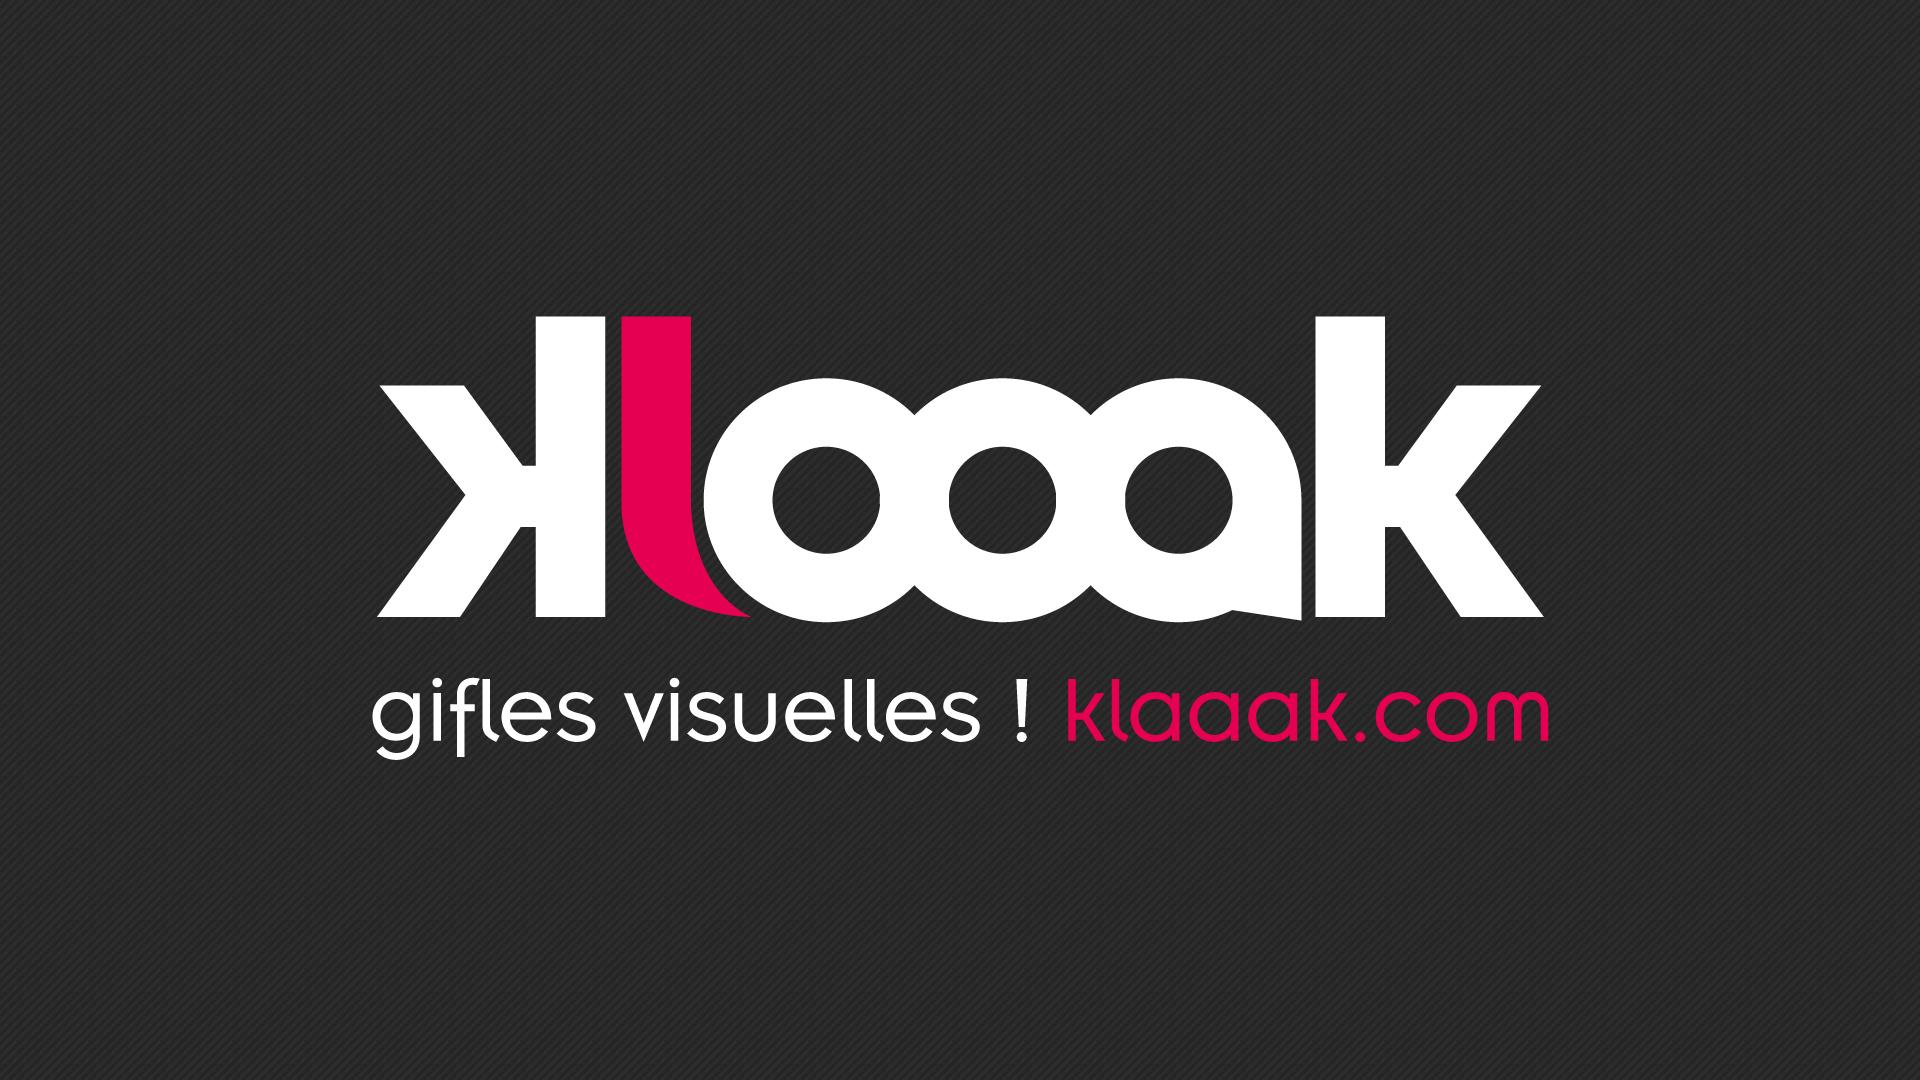 klaaak-creation-logo-identite-visuelle-communication-caconcept-alexis-cretin-graphiste